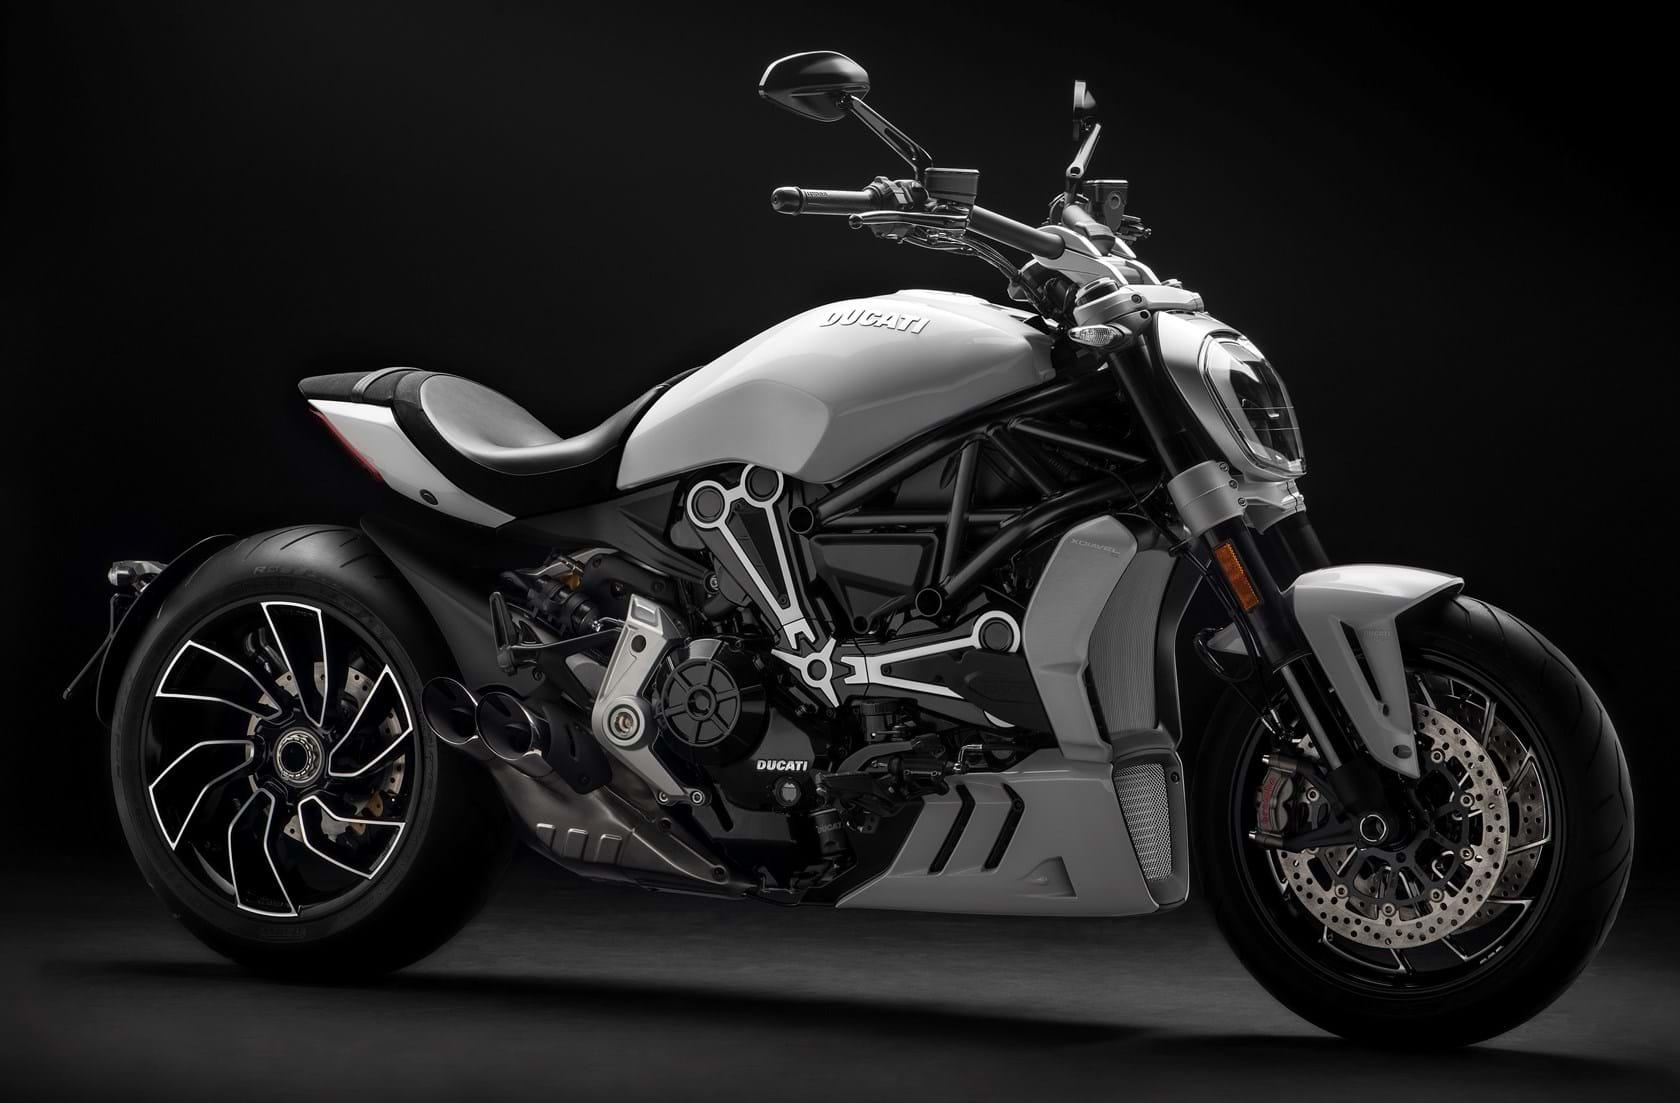 For Sale Ducati Xdiavel S The Bike Market